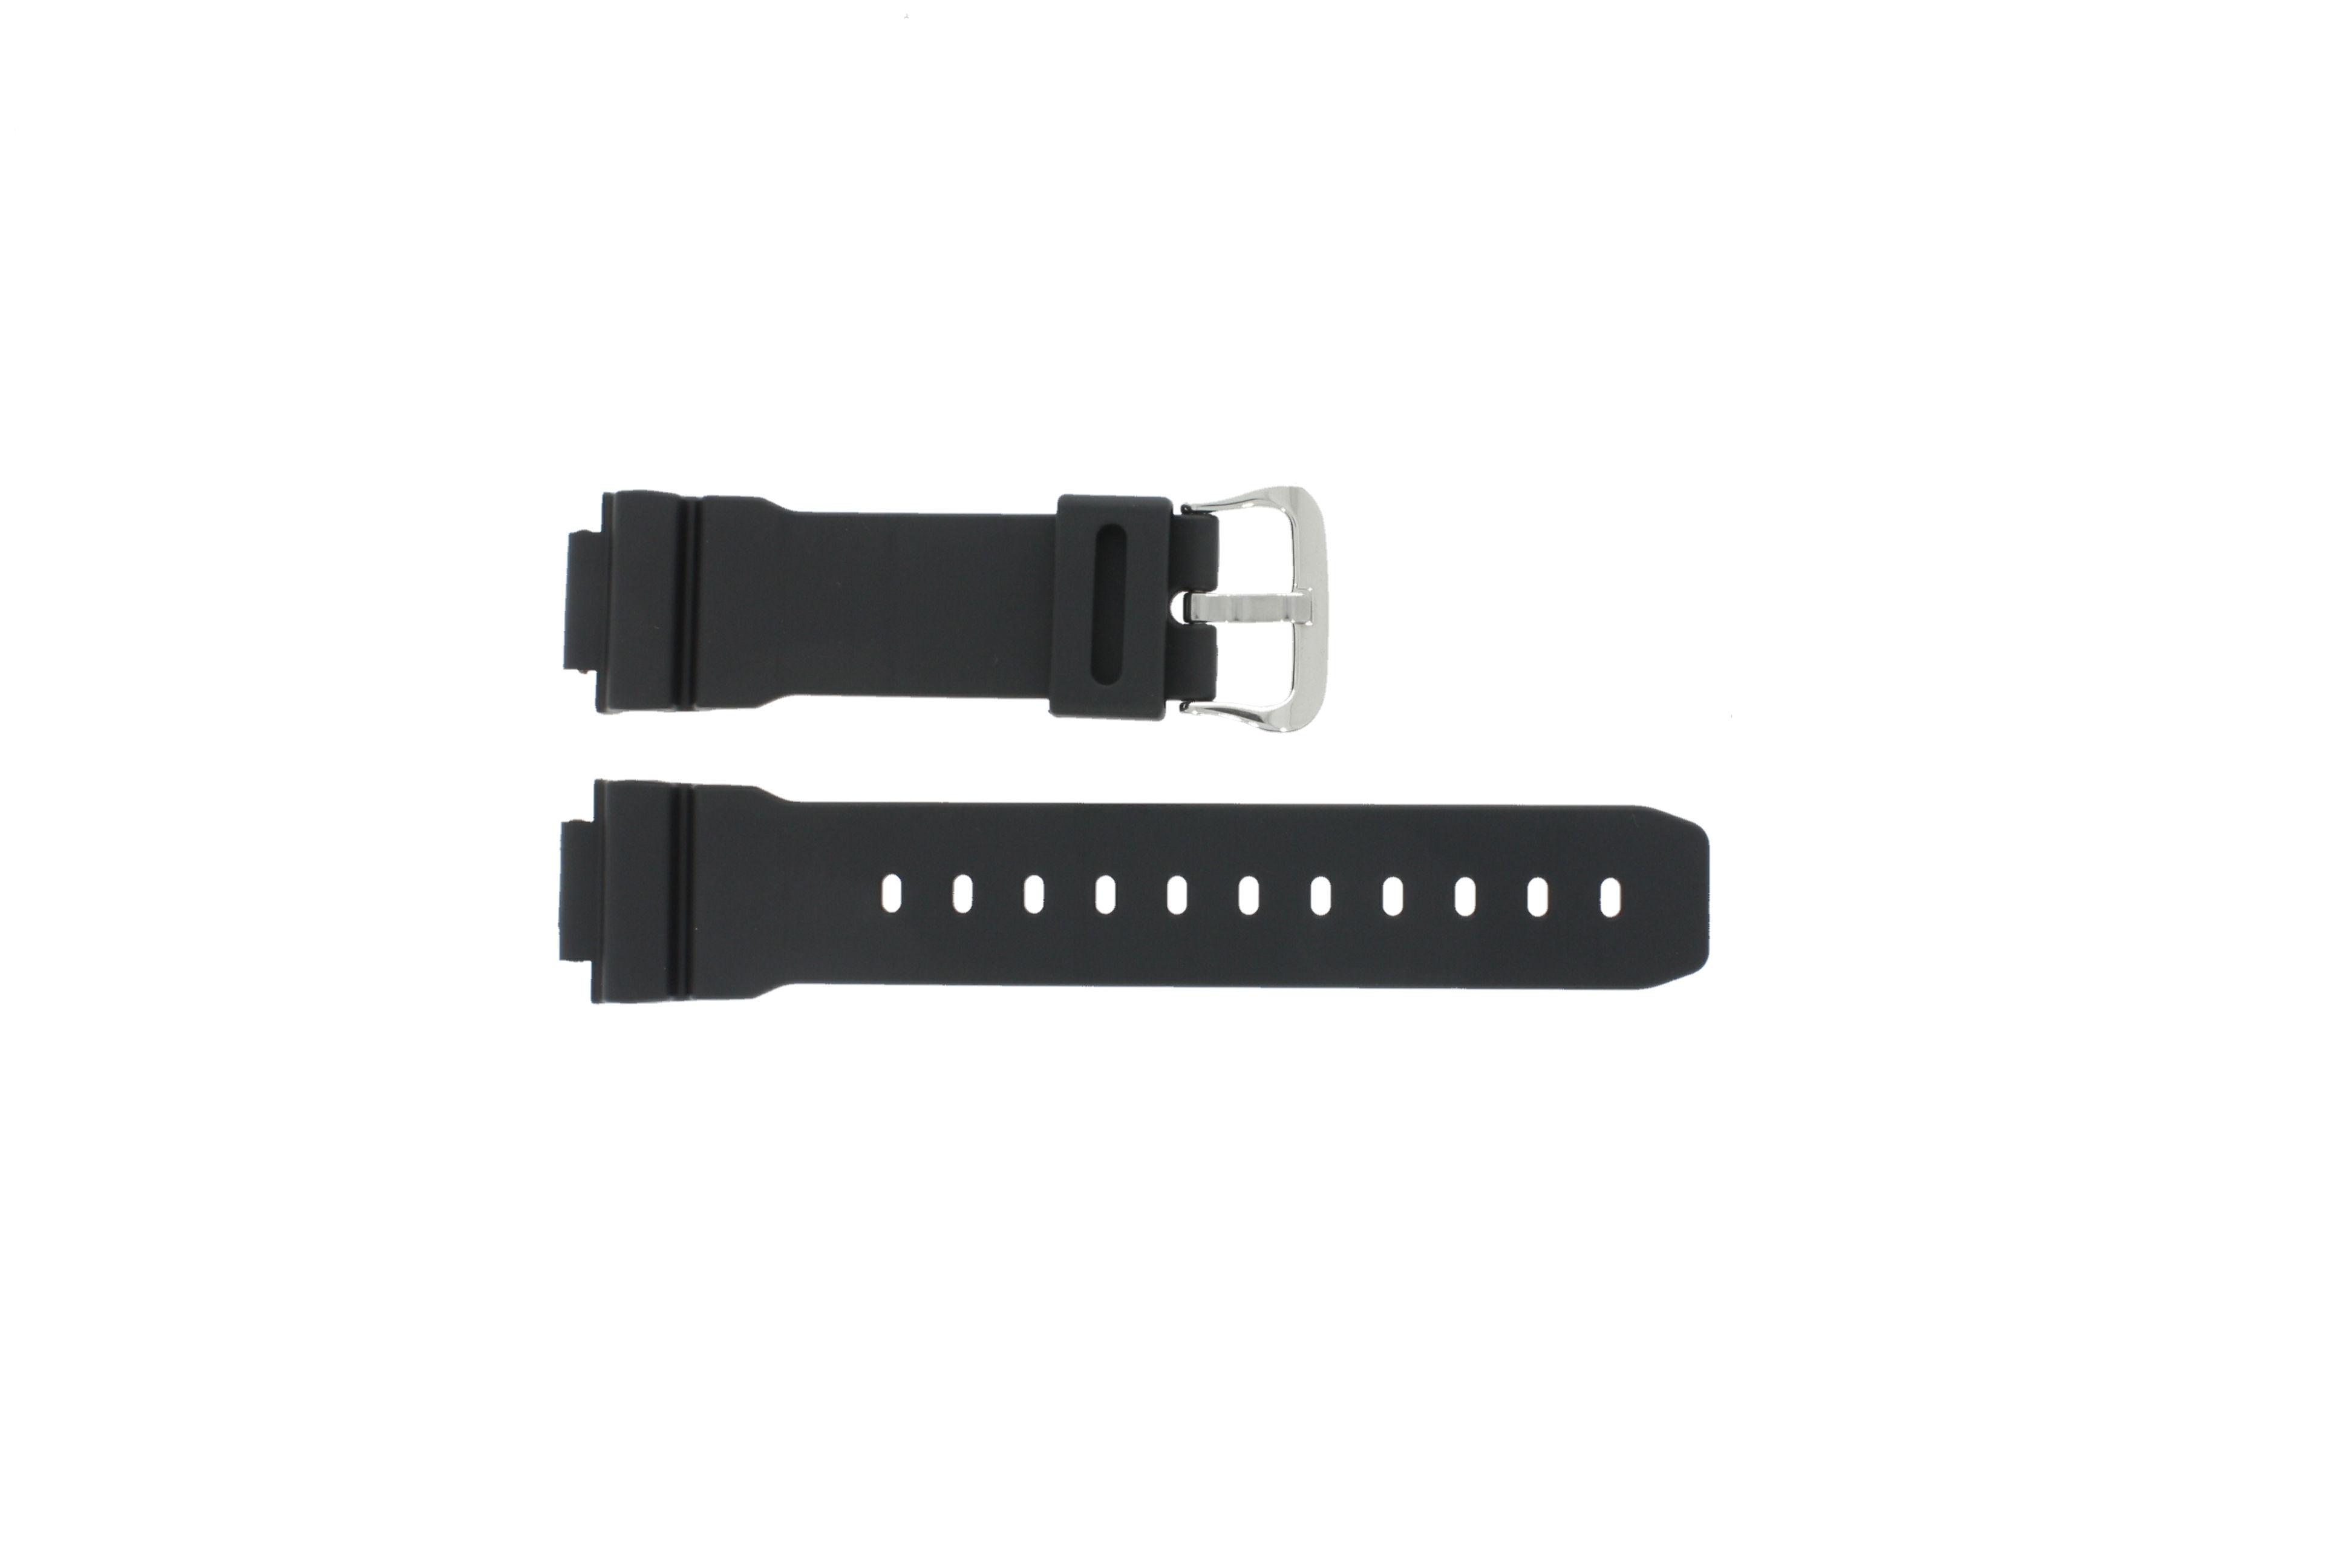 Casio horlogeband DW-004C-1VST / DW-9051-DW-9052 / 71606395 Kunststof / Plastic Zwart 16mm